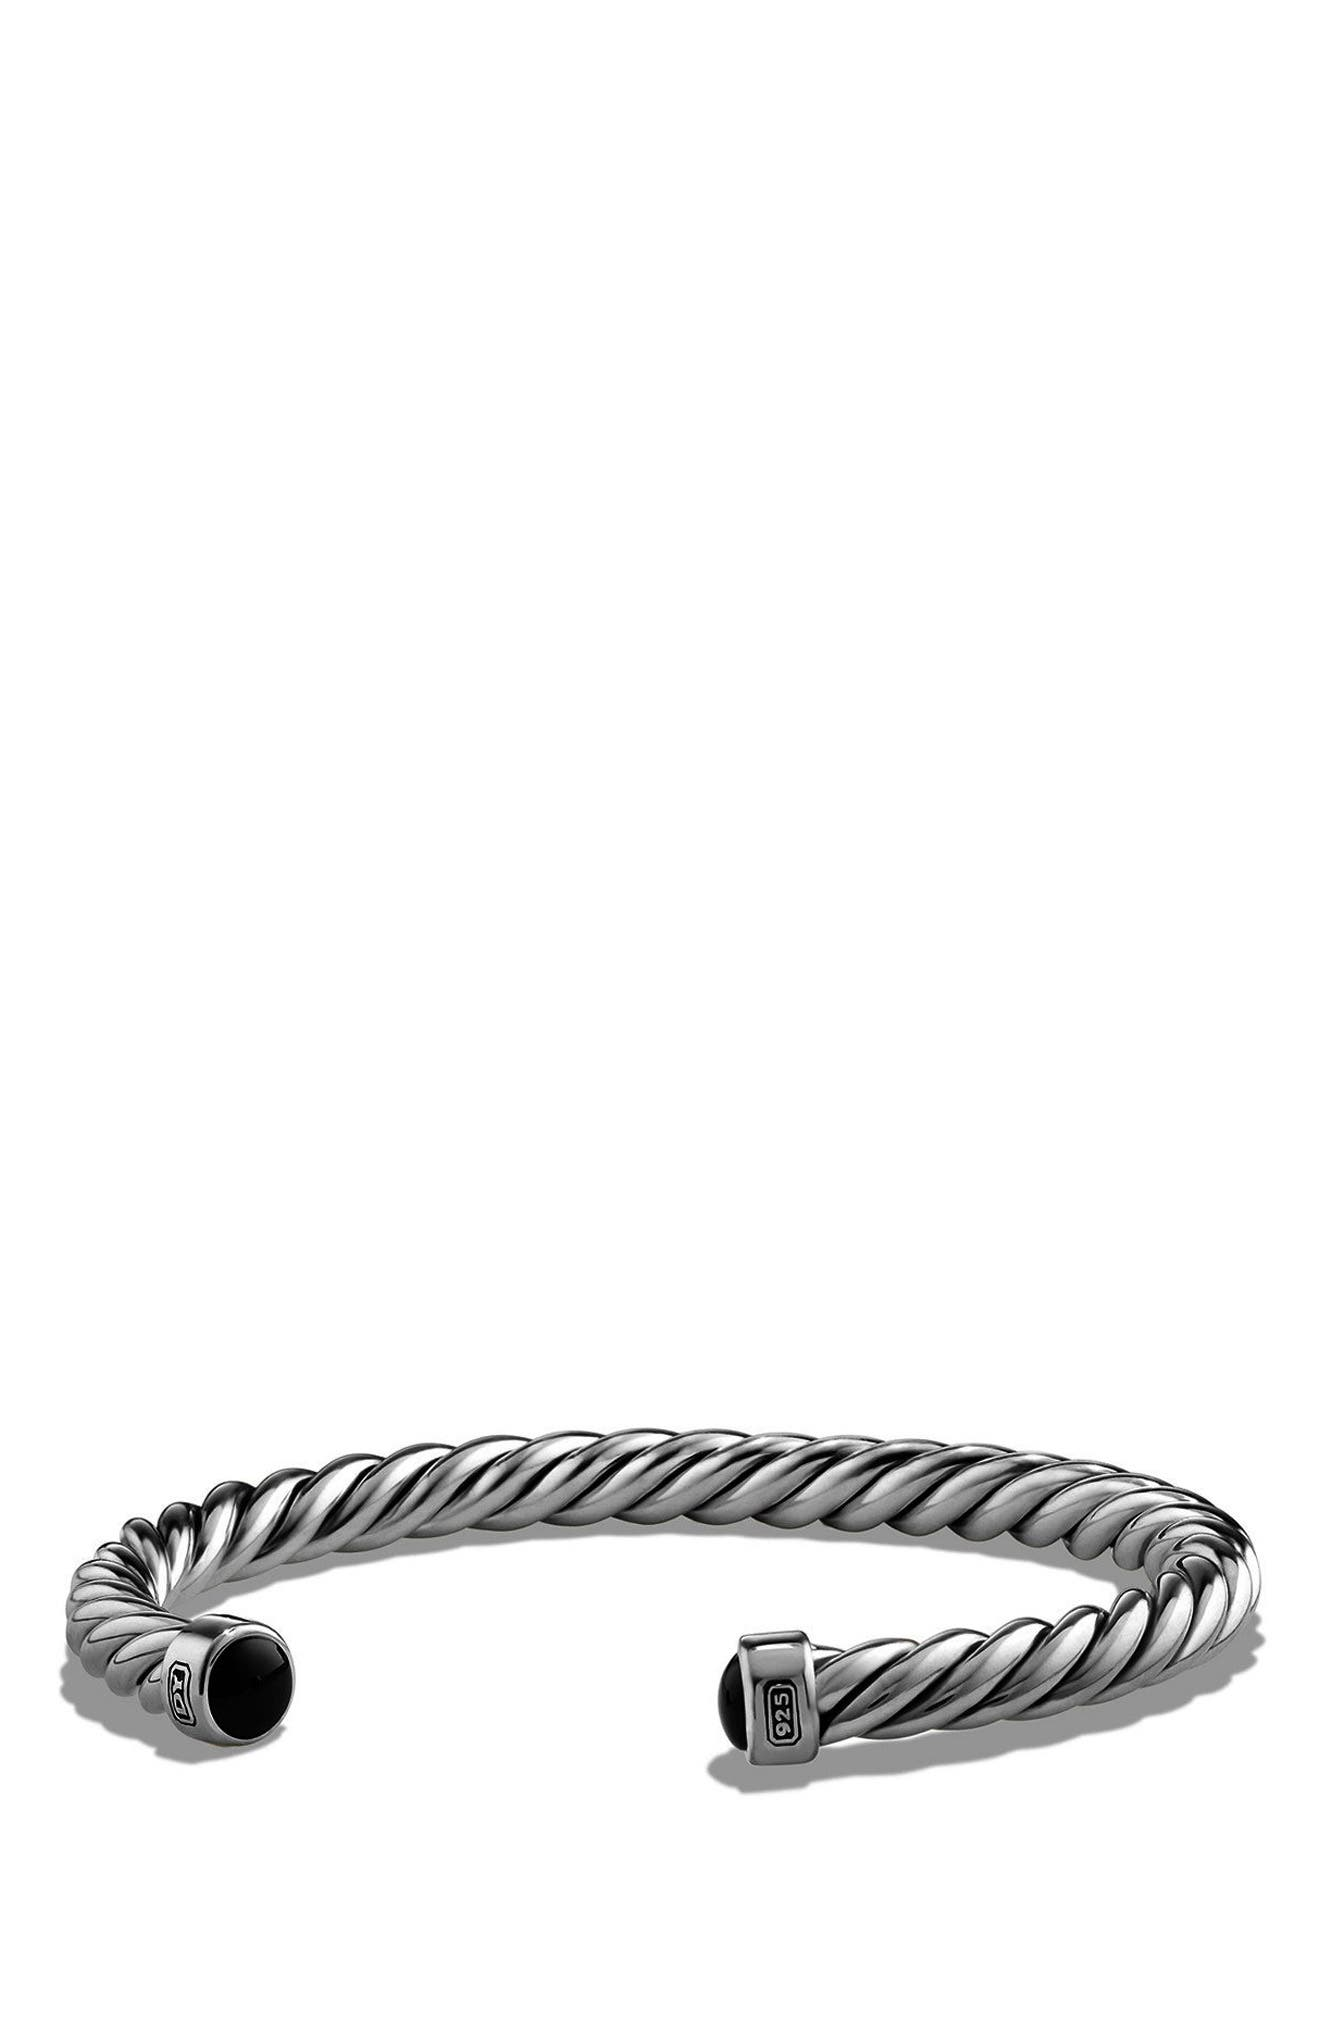 'Cable Classics' Cuff Bracelet,                         Main,                         color, SILVER/ BLACK ONYX